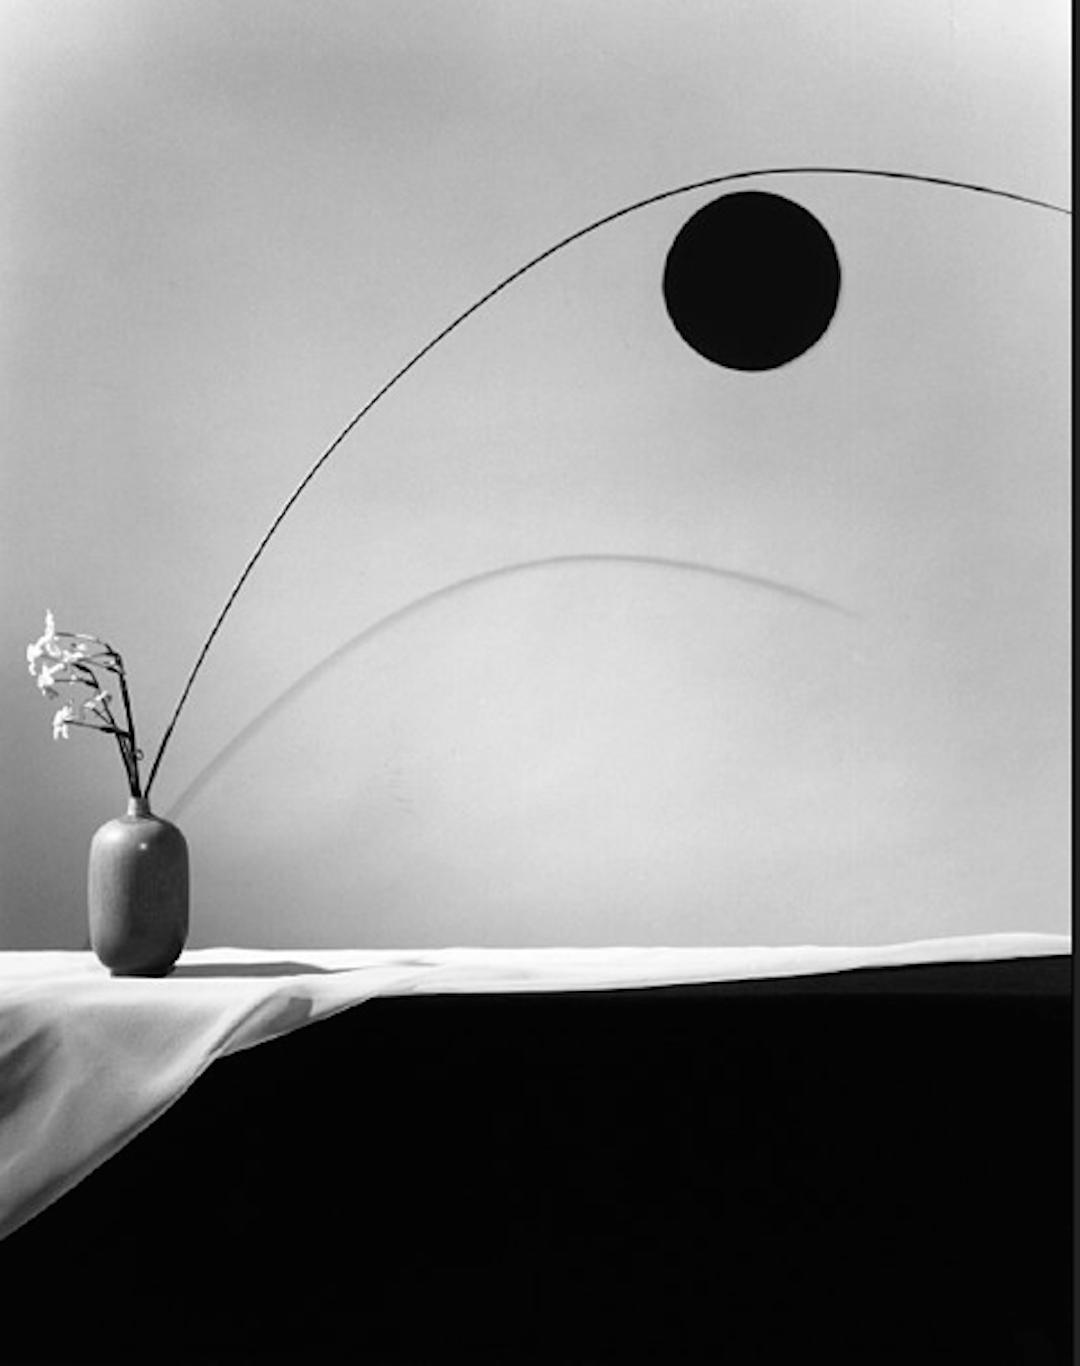 Flower 1983 by Robert Mapplethorpe